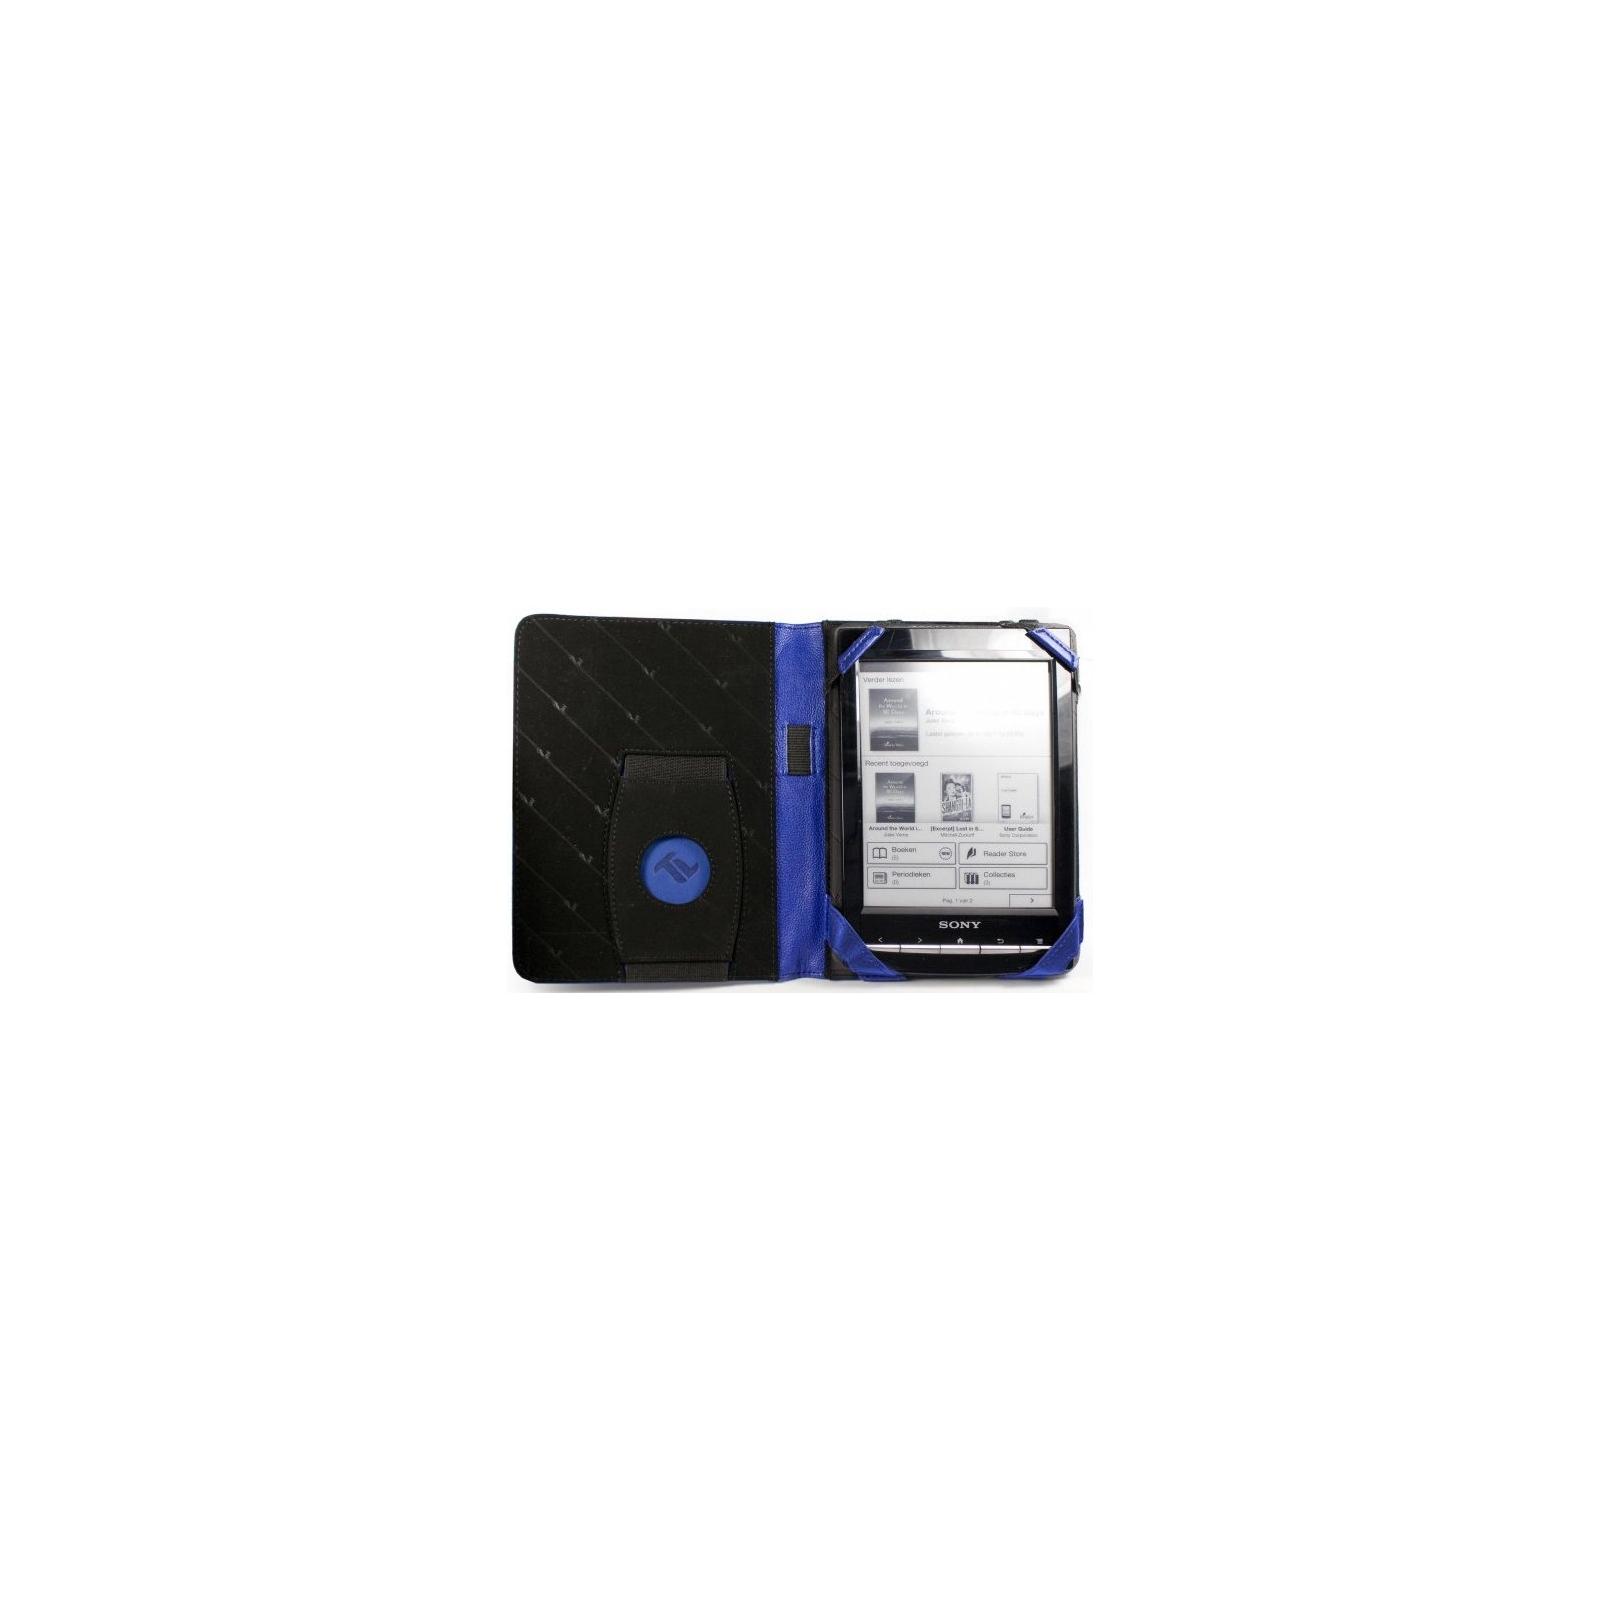 Чехол для электронной книги Tuff-Luv 6 Embrace faux leather/Electric Blue (C4_53) изображение 3